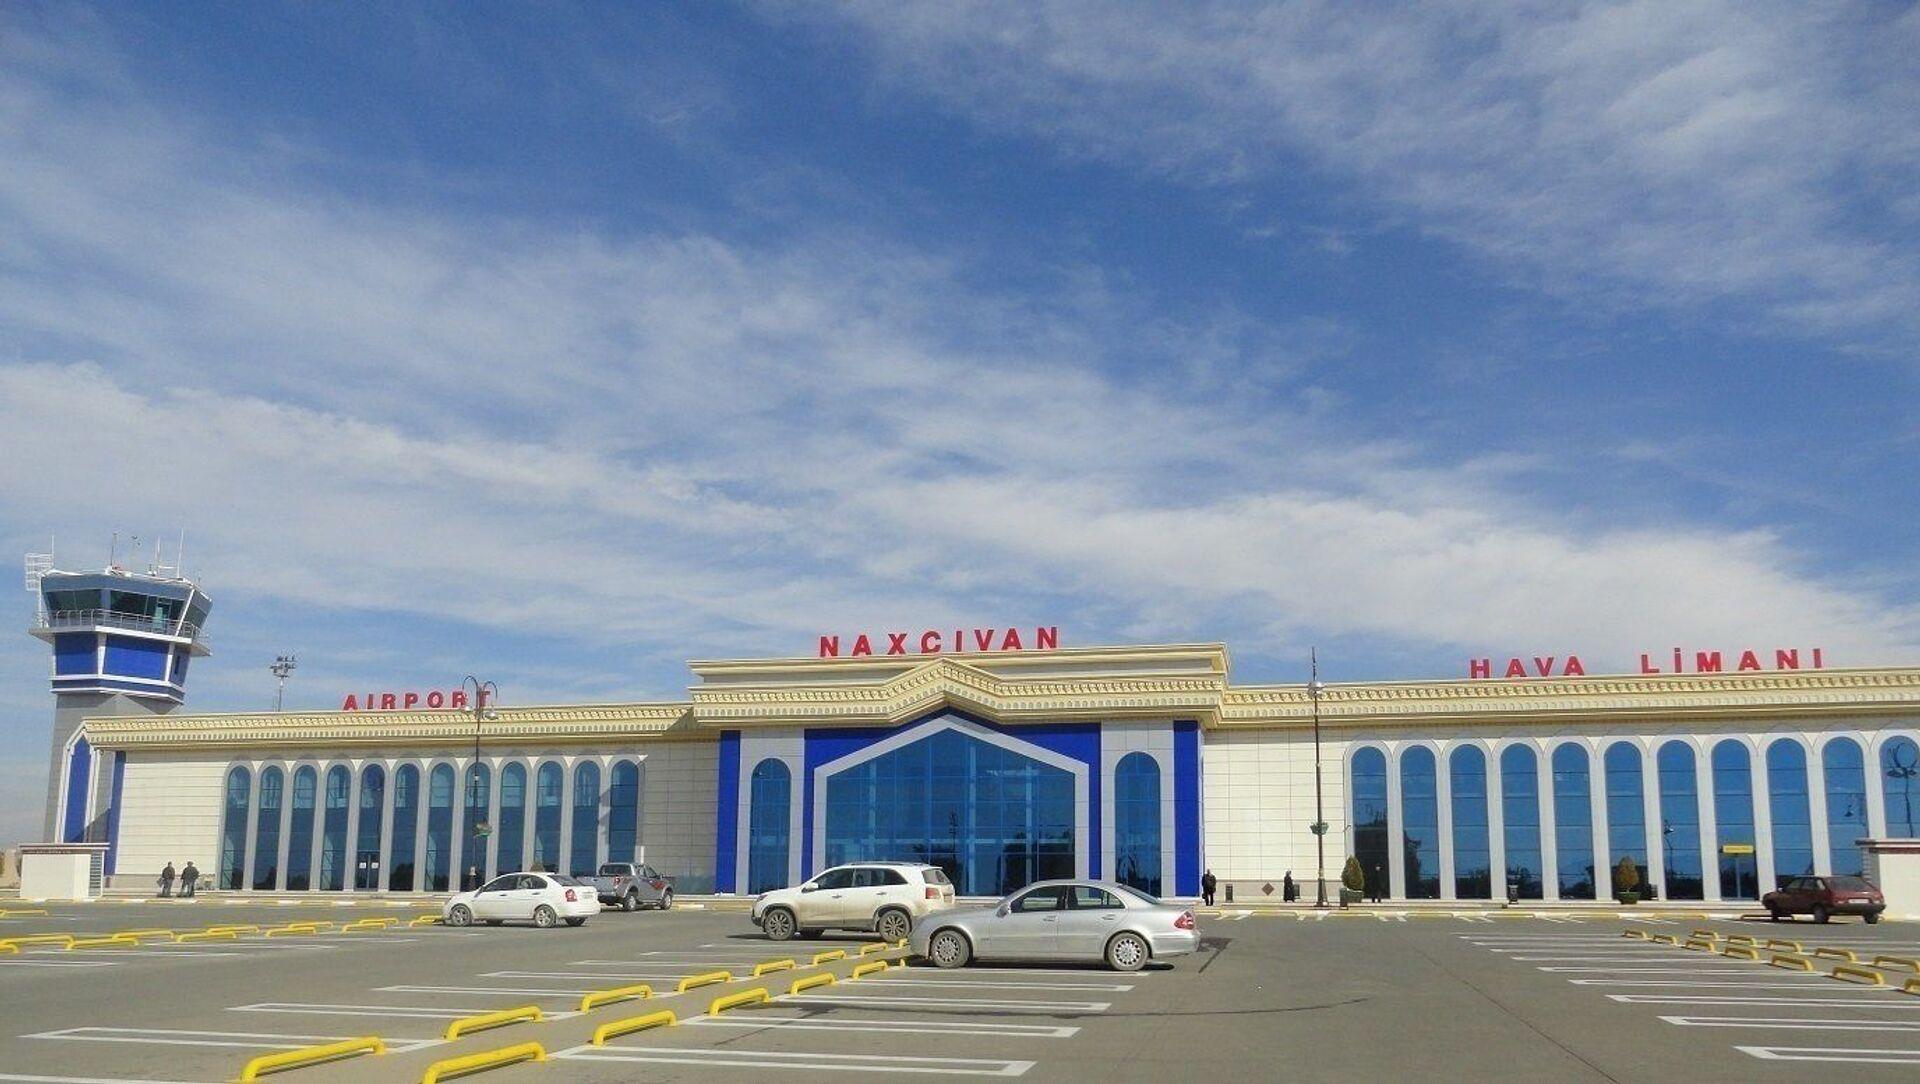 Нахчыванский аэропорт, фото из архива - Sputnik Азербайджан, 1920, 23.06.2021